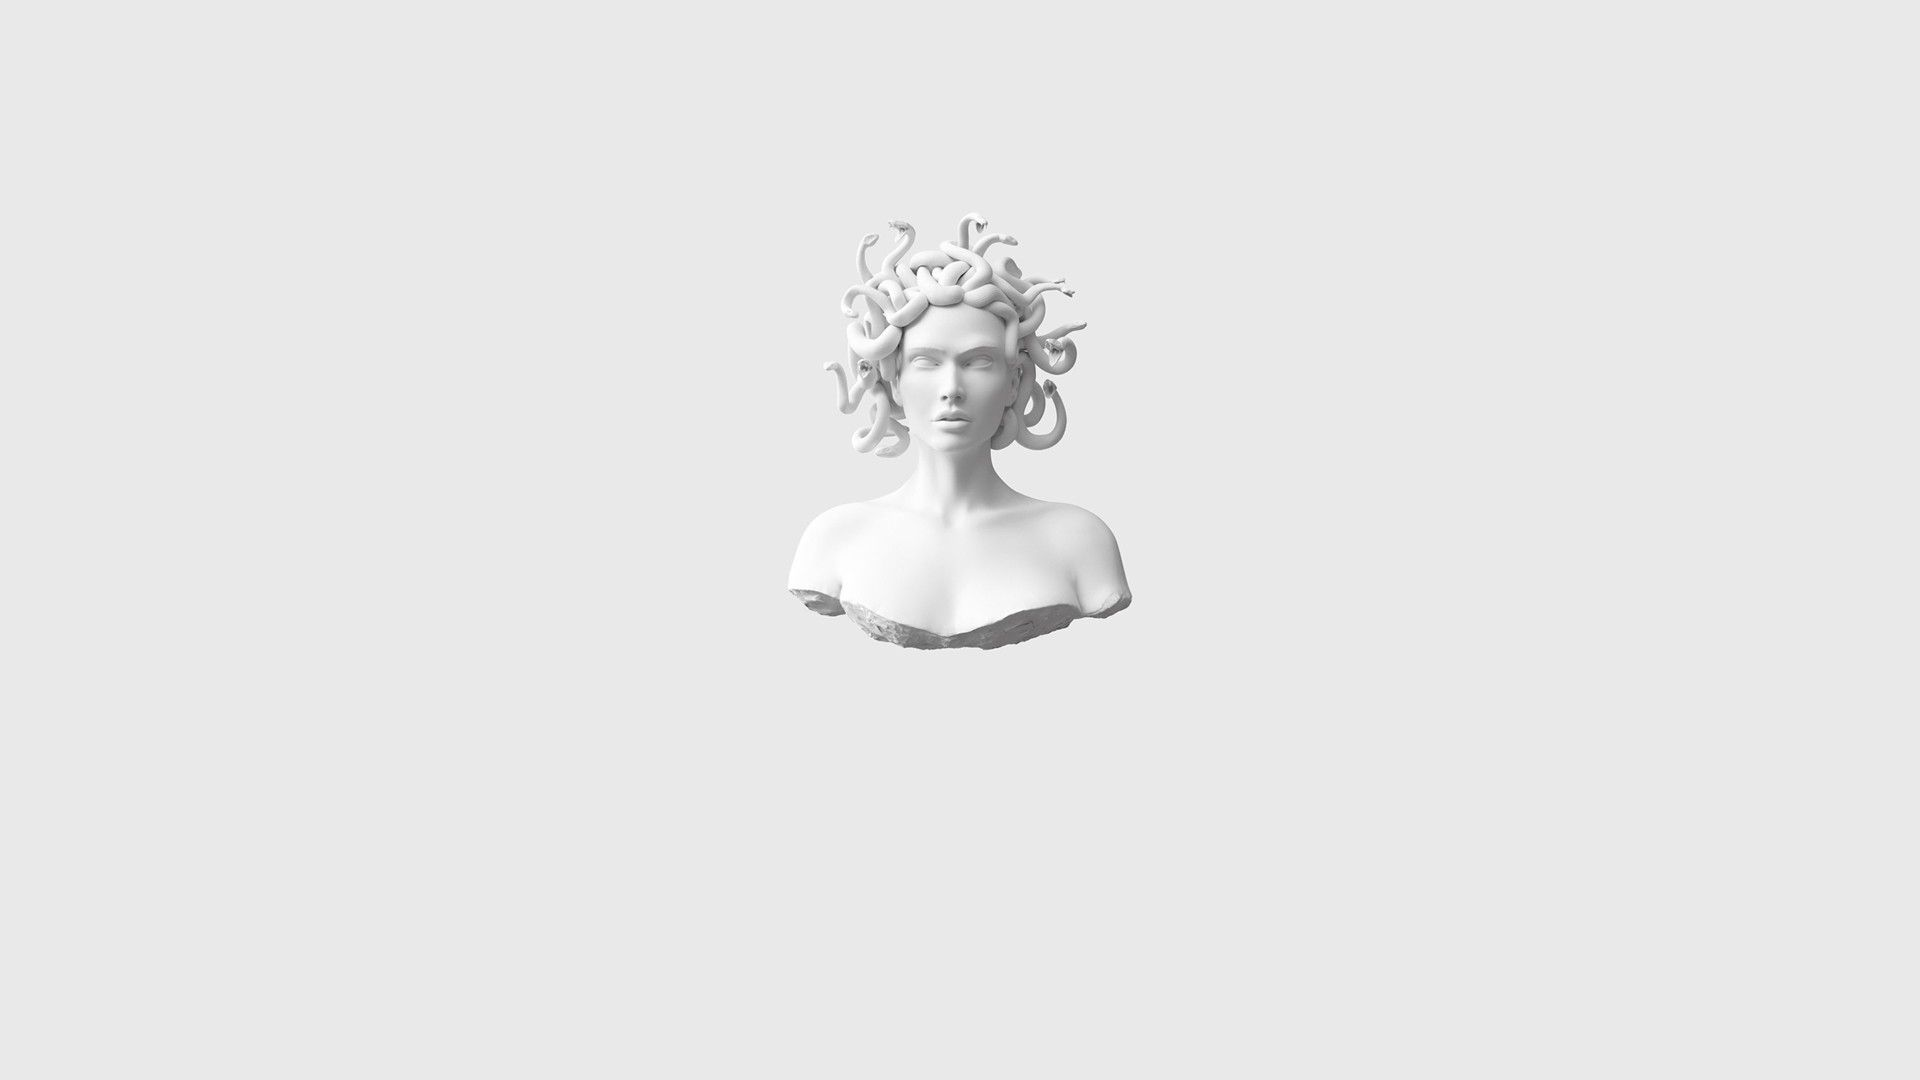 White Minimalism HD Desktop Wallpaper